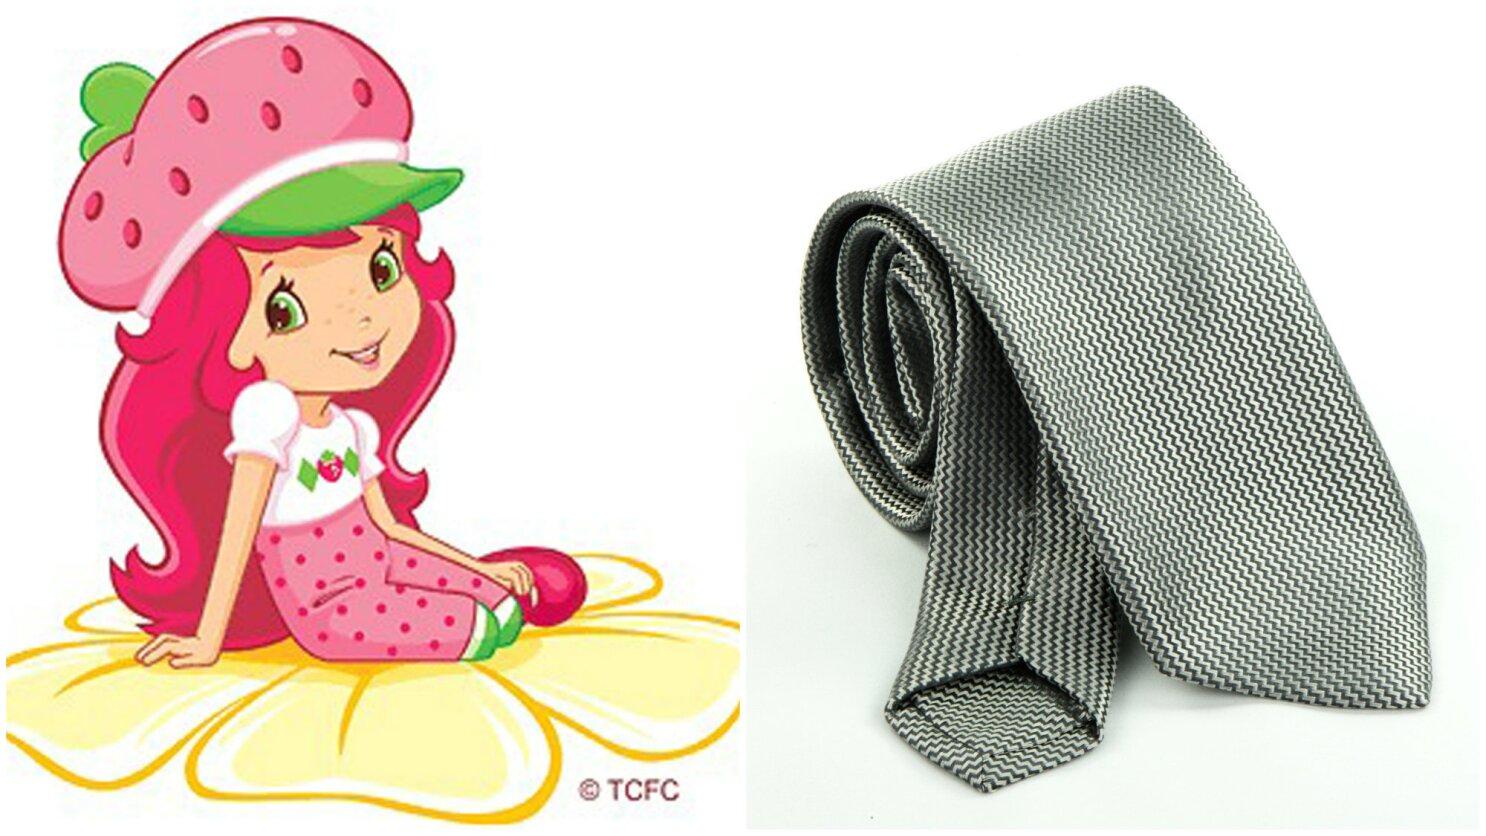 Fashion News Goorin Hats Grey Ties Strawberry Shortcake Los